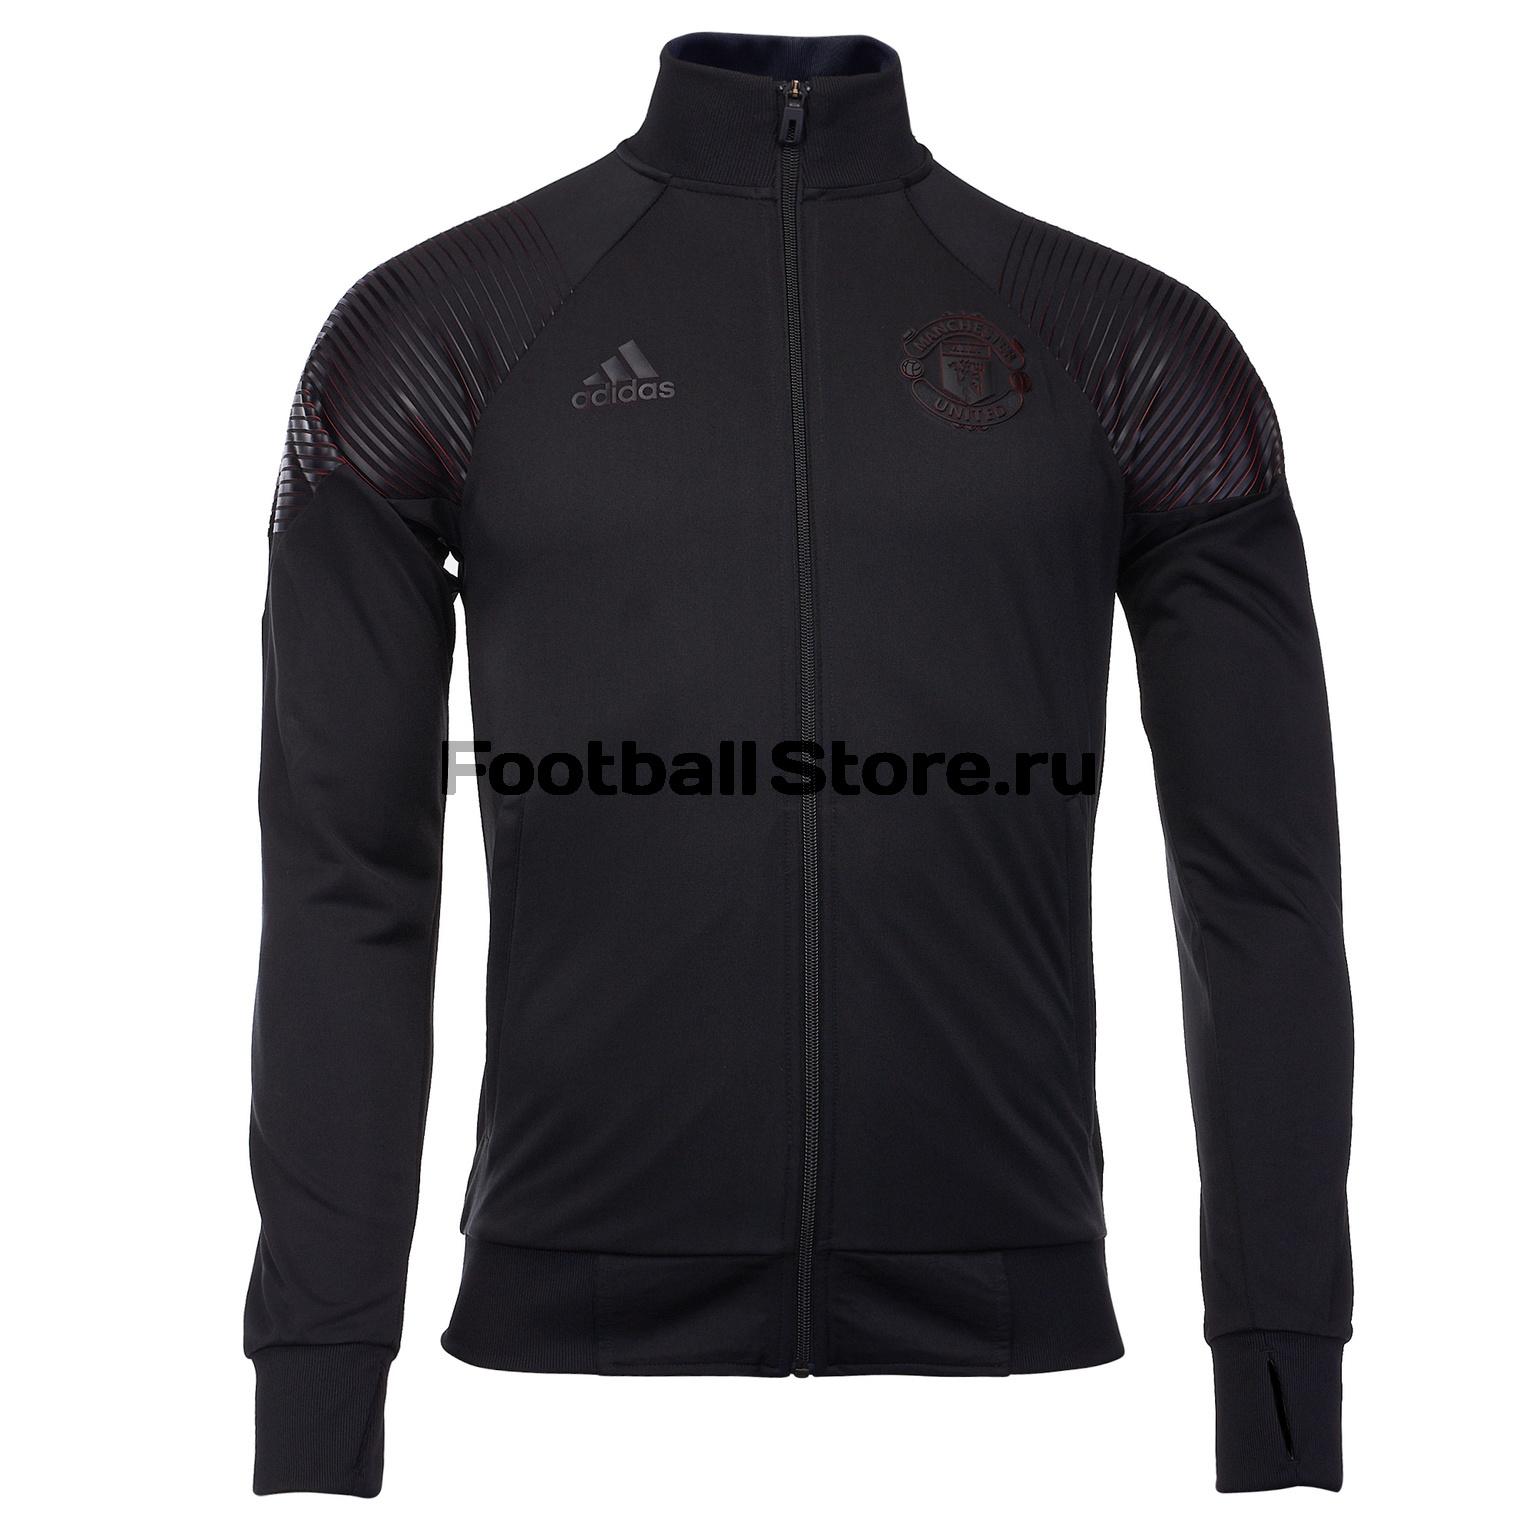 Олимпийка Adidas Manchester United 2018/19 цена